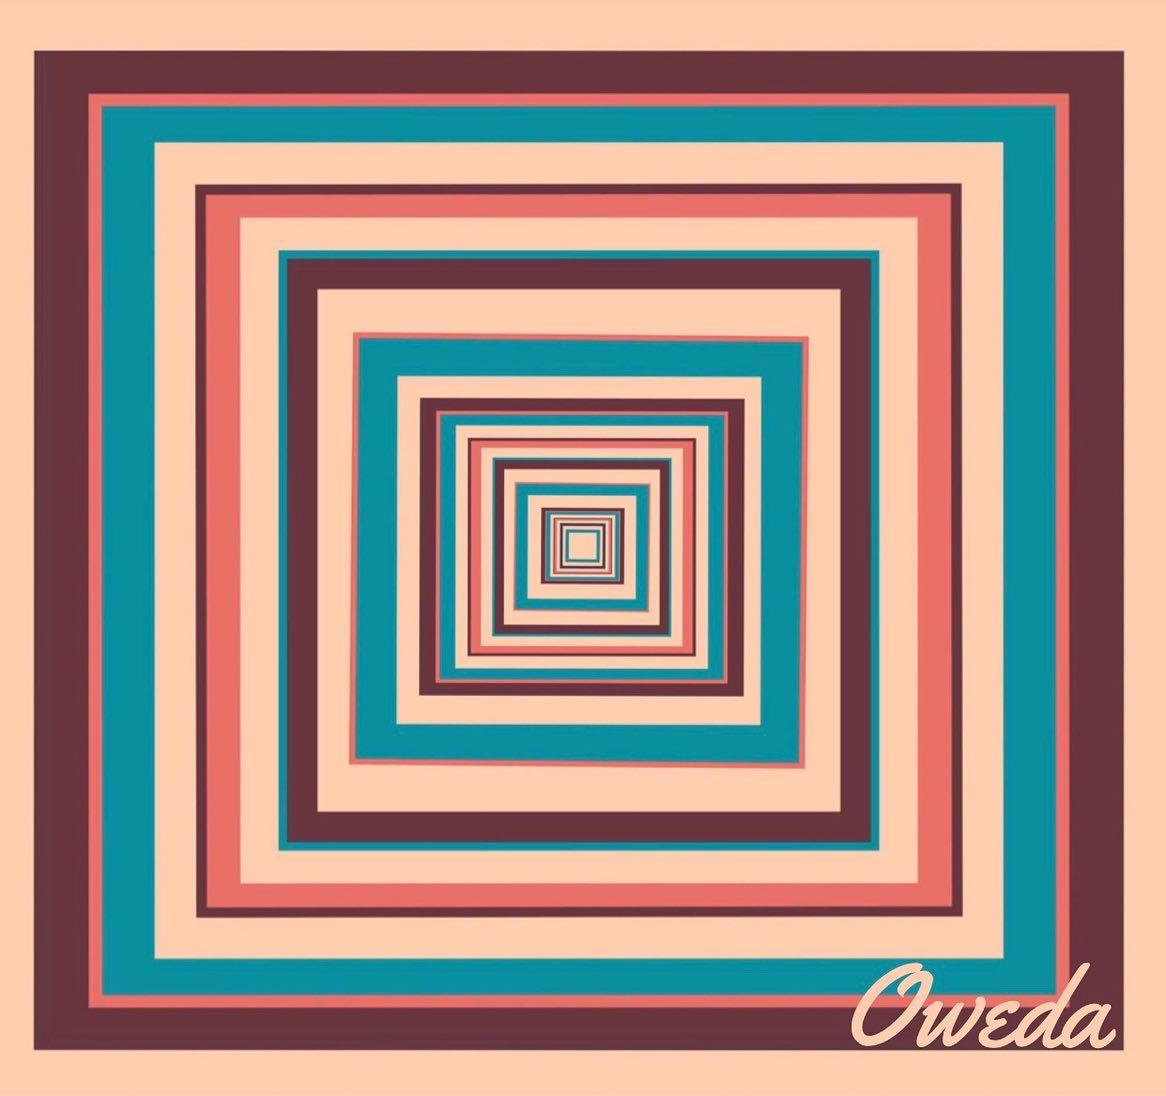 Oweda3823AlbumCover